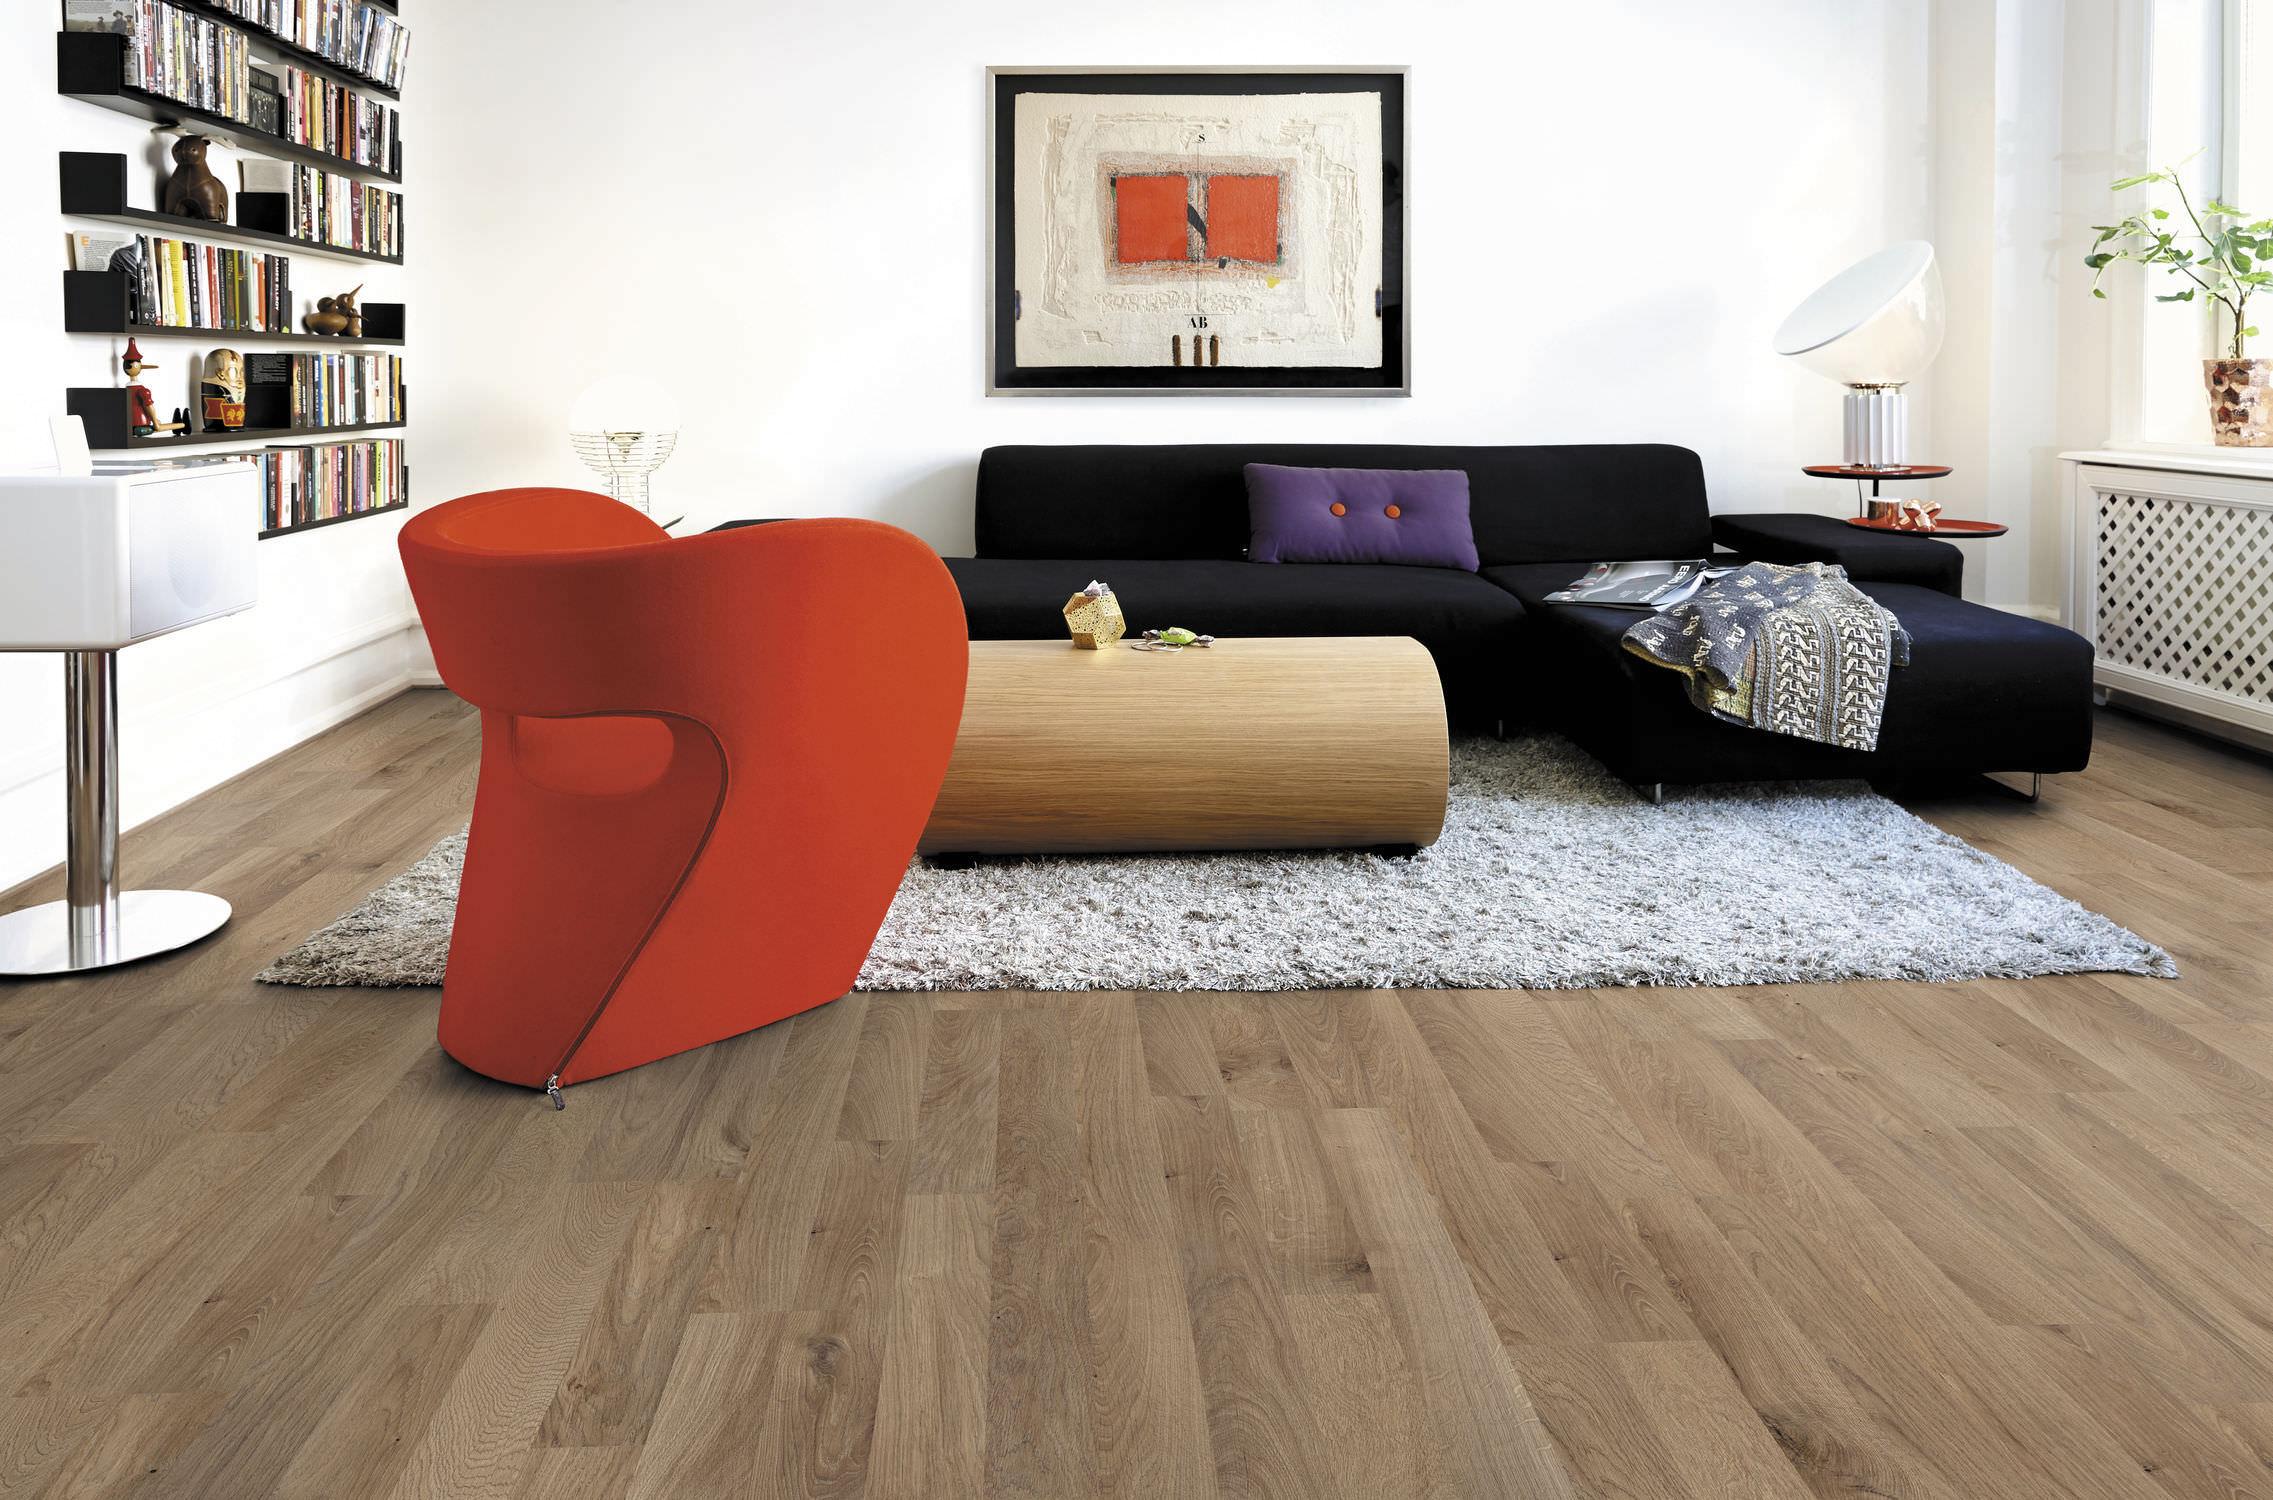 Hdf Laminate Flooring Fit Wood Look For Public Buildings Kashmere Oak L0201 01798